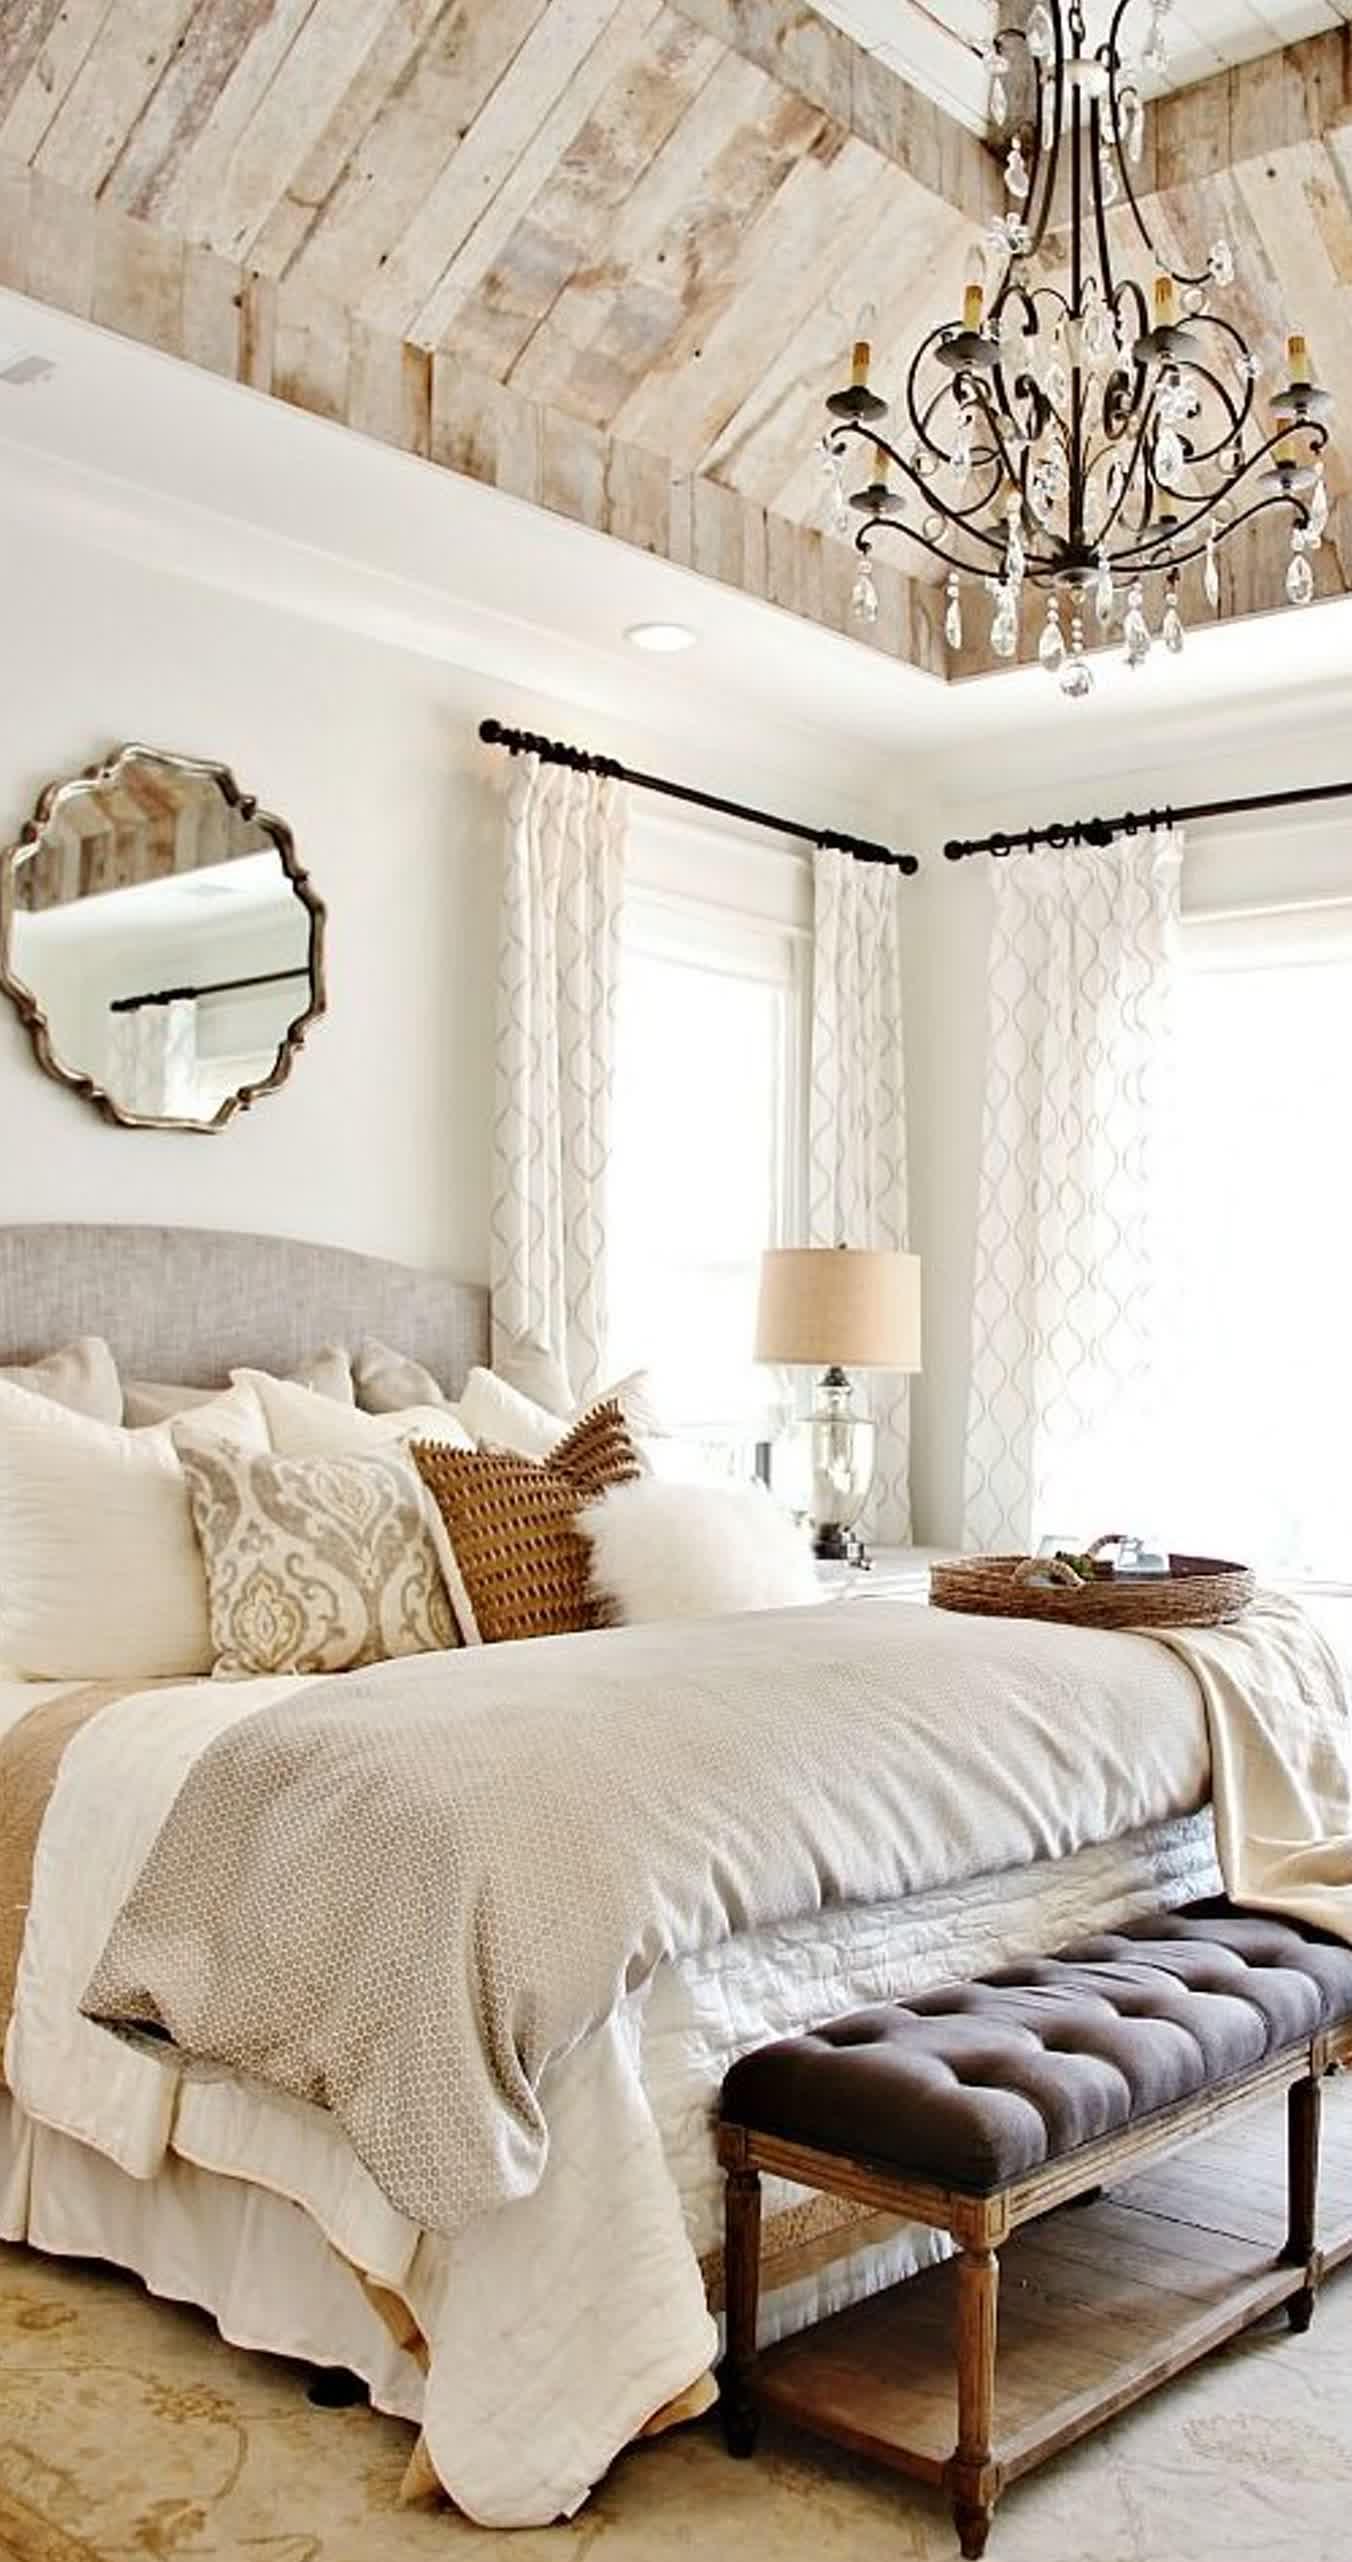 title | Rustic Modern Bedroom Ideas